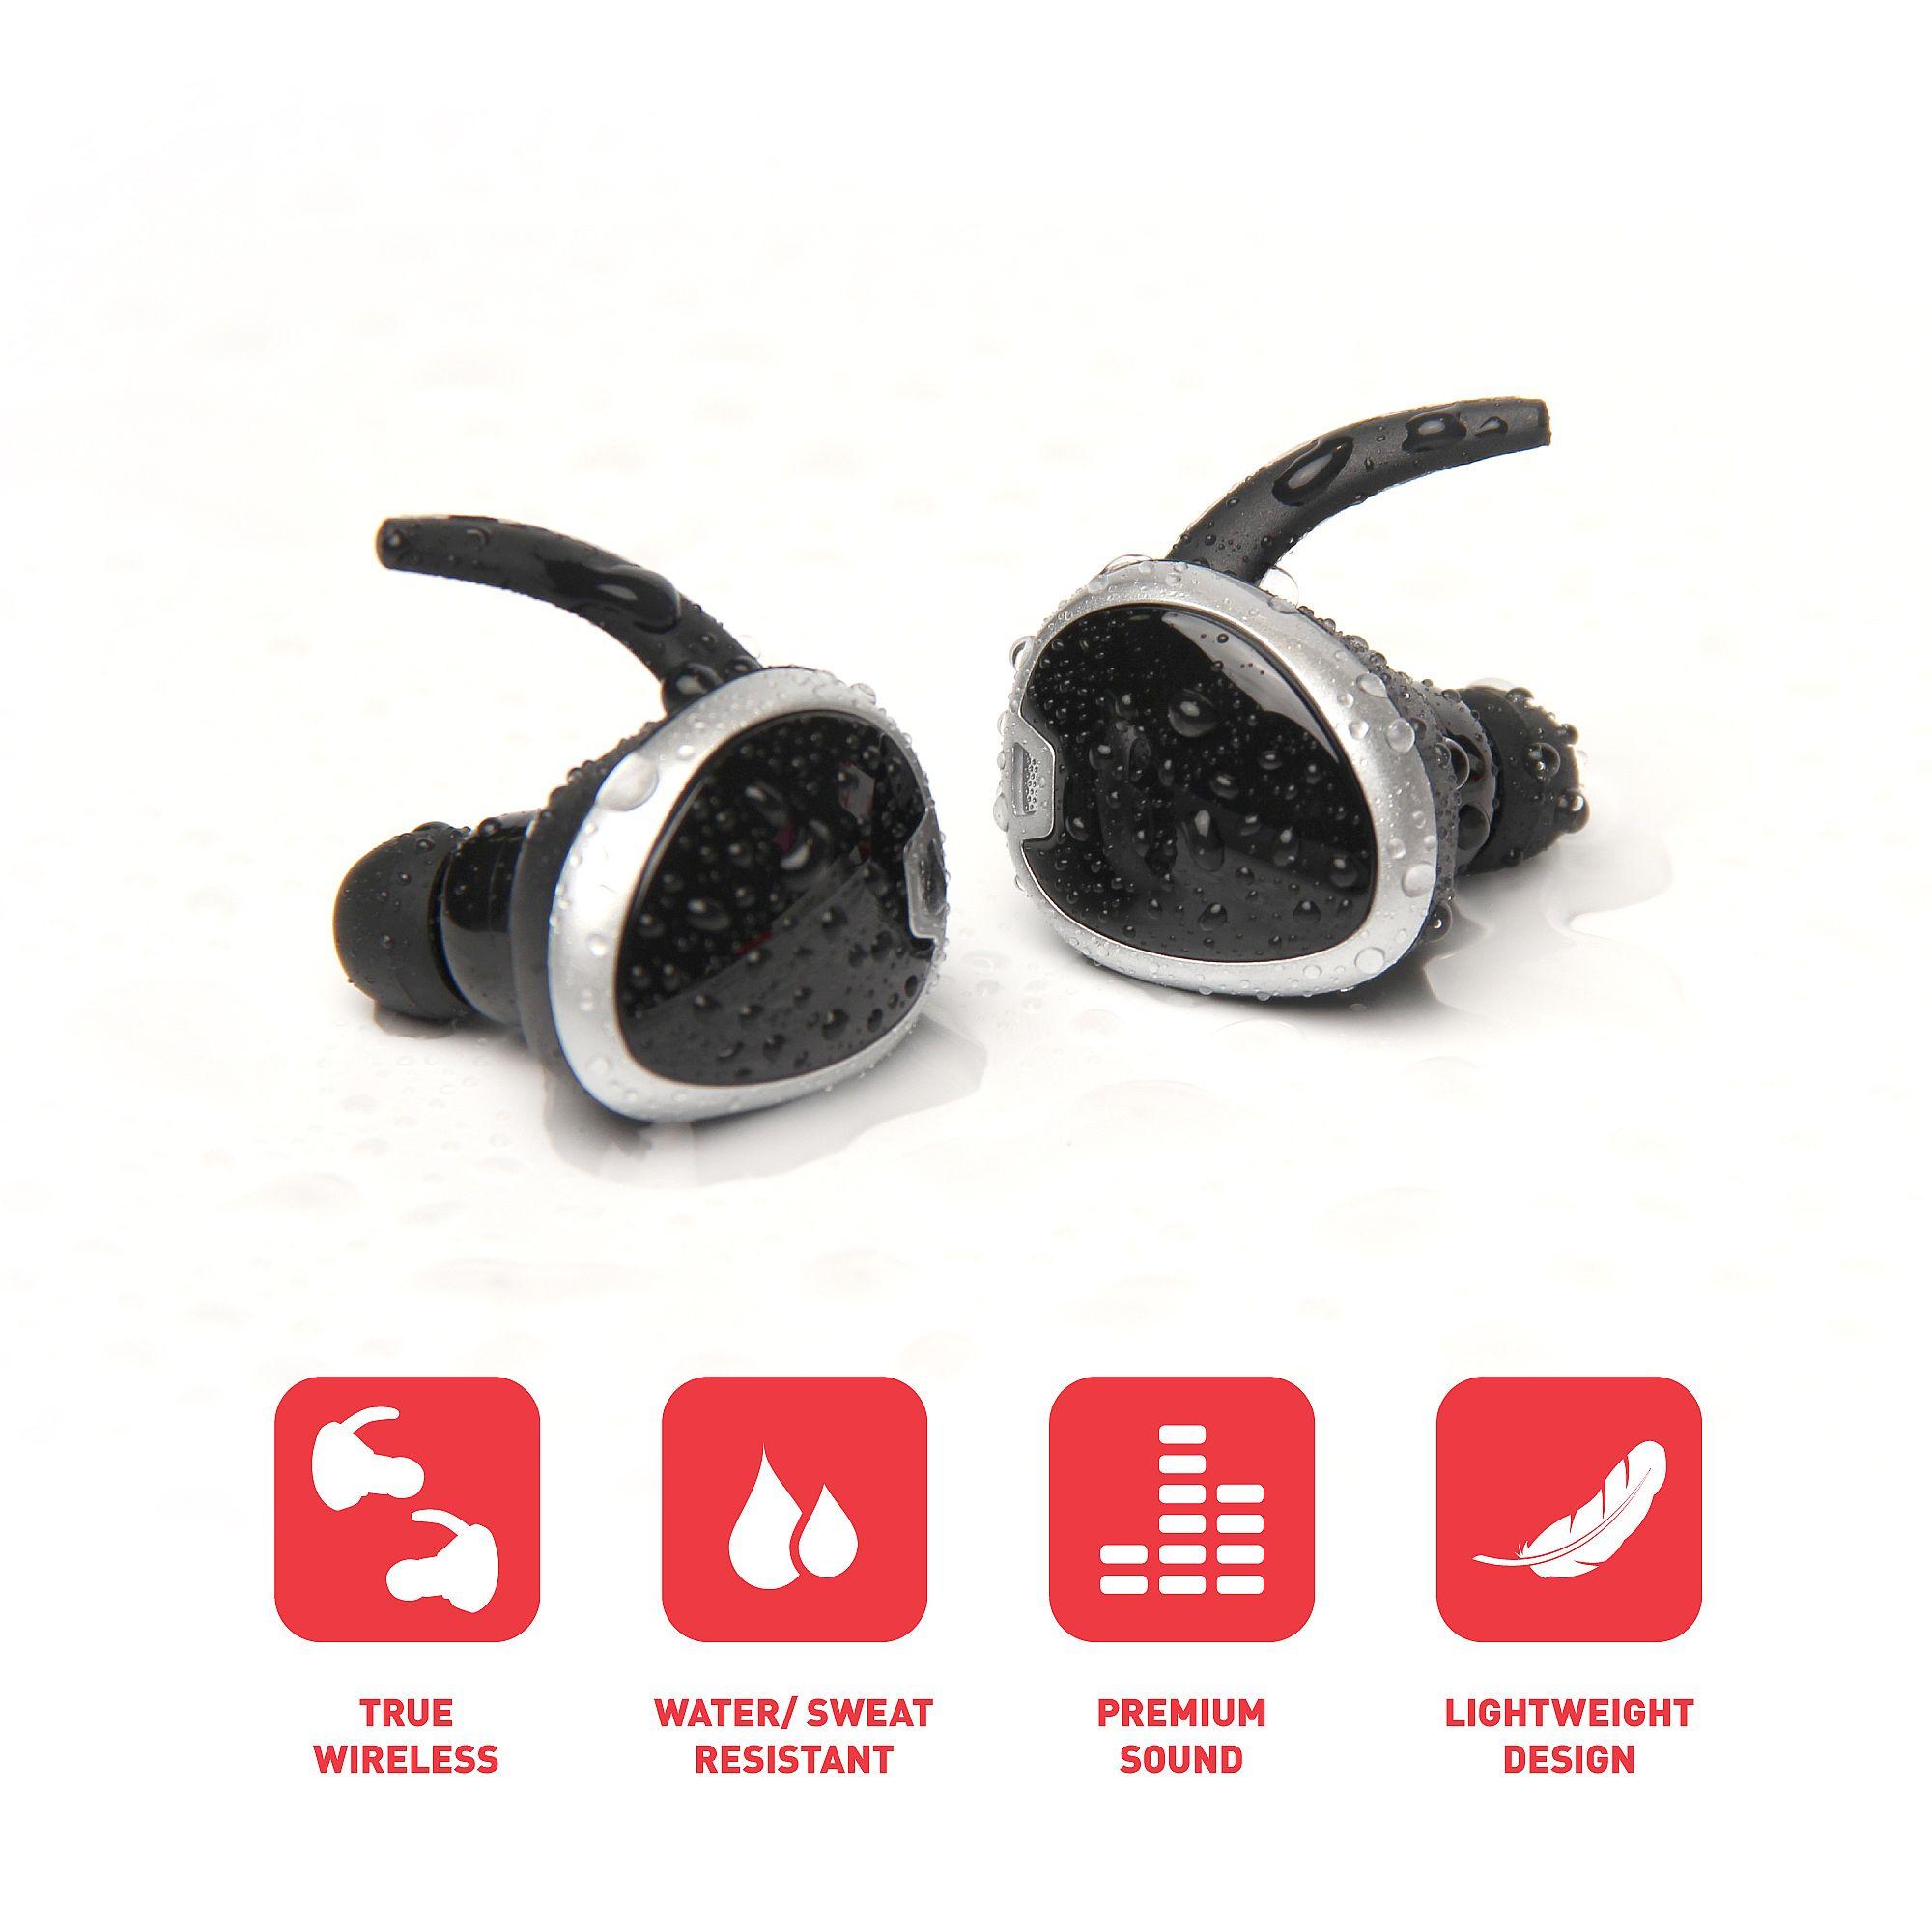 revjams studio tws true wireless bluetooth sport stereo earbuds rose gold at. Black Bedroom Furniture Sets. Home Design Ideas